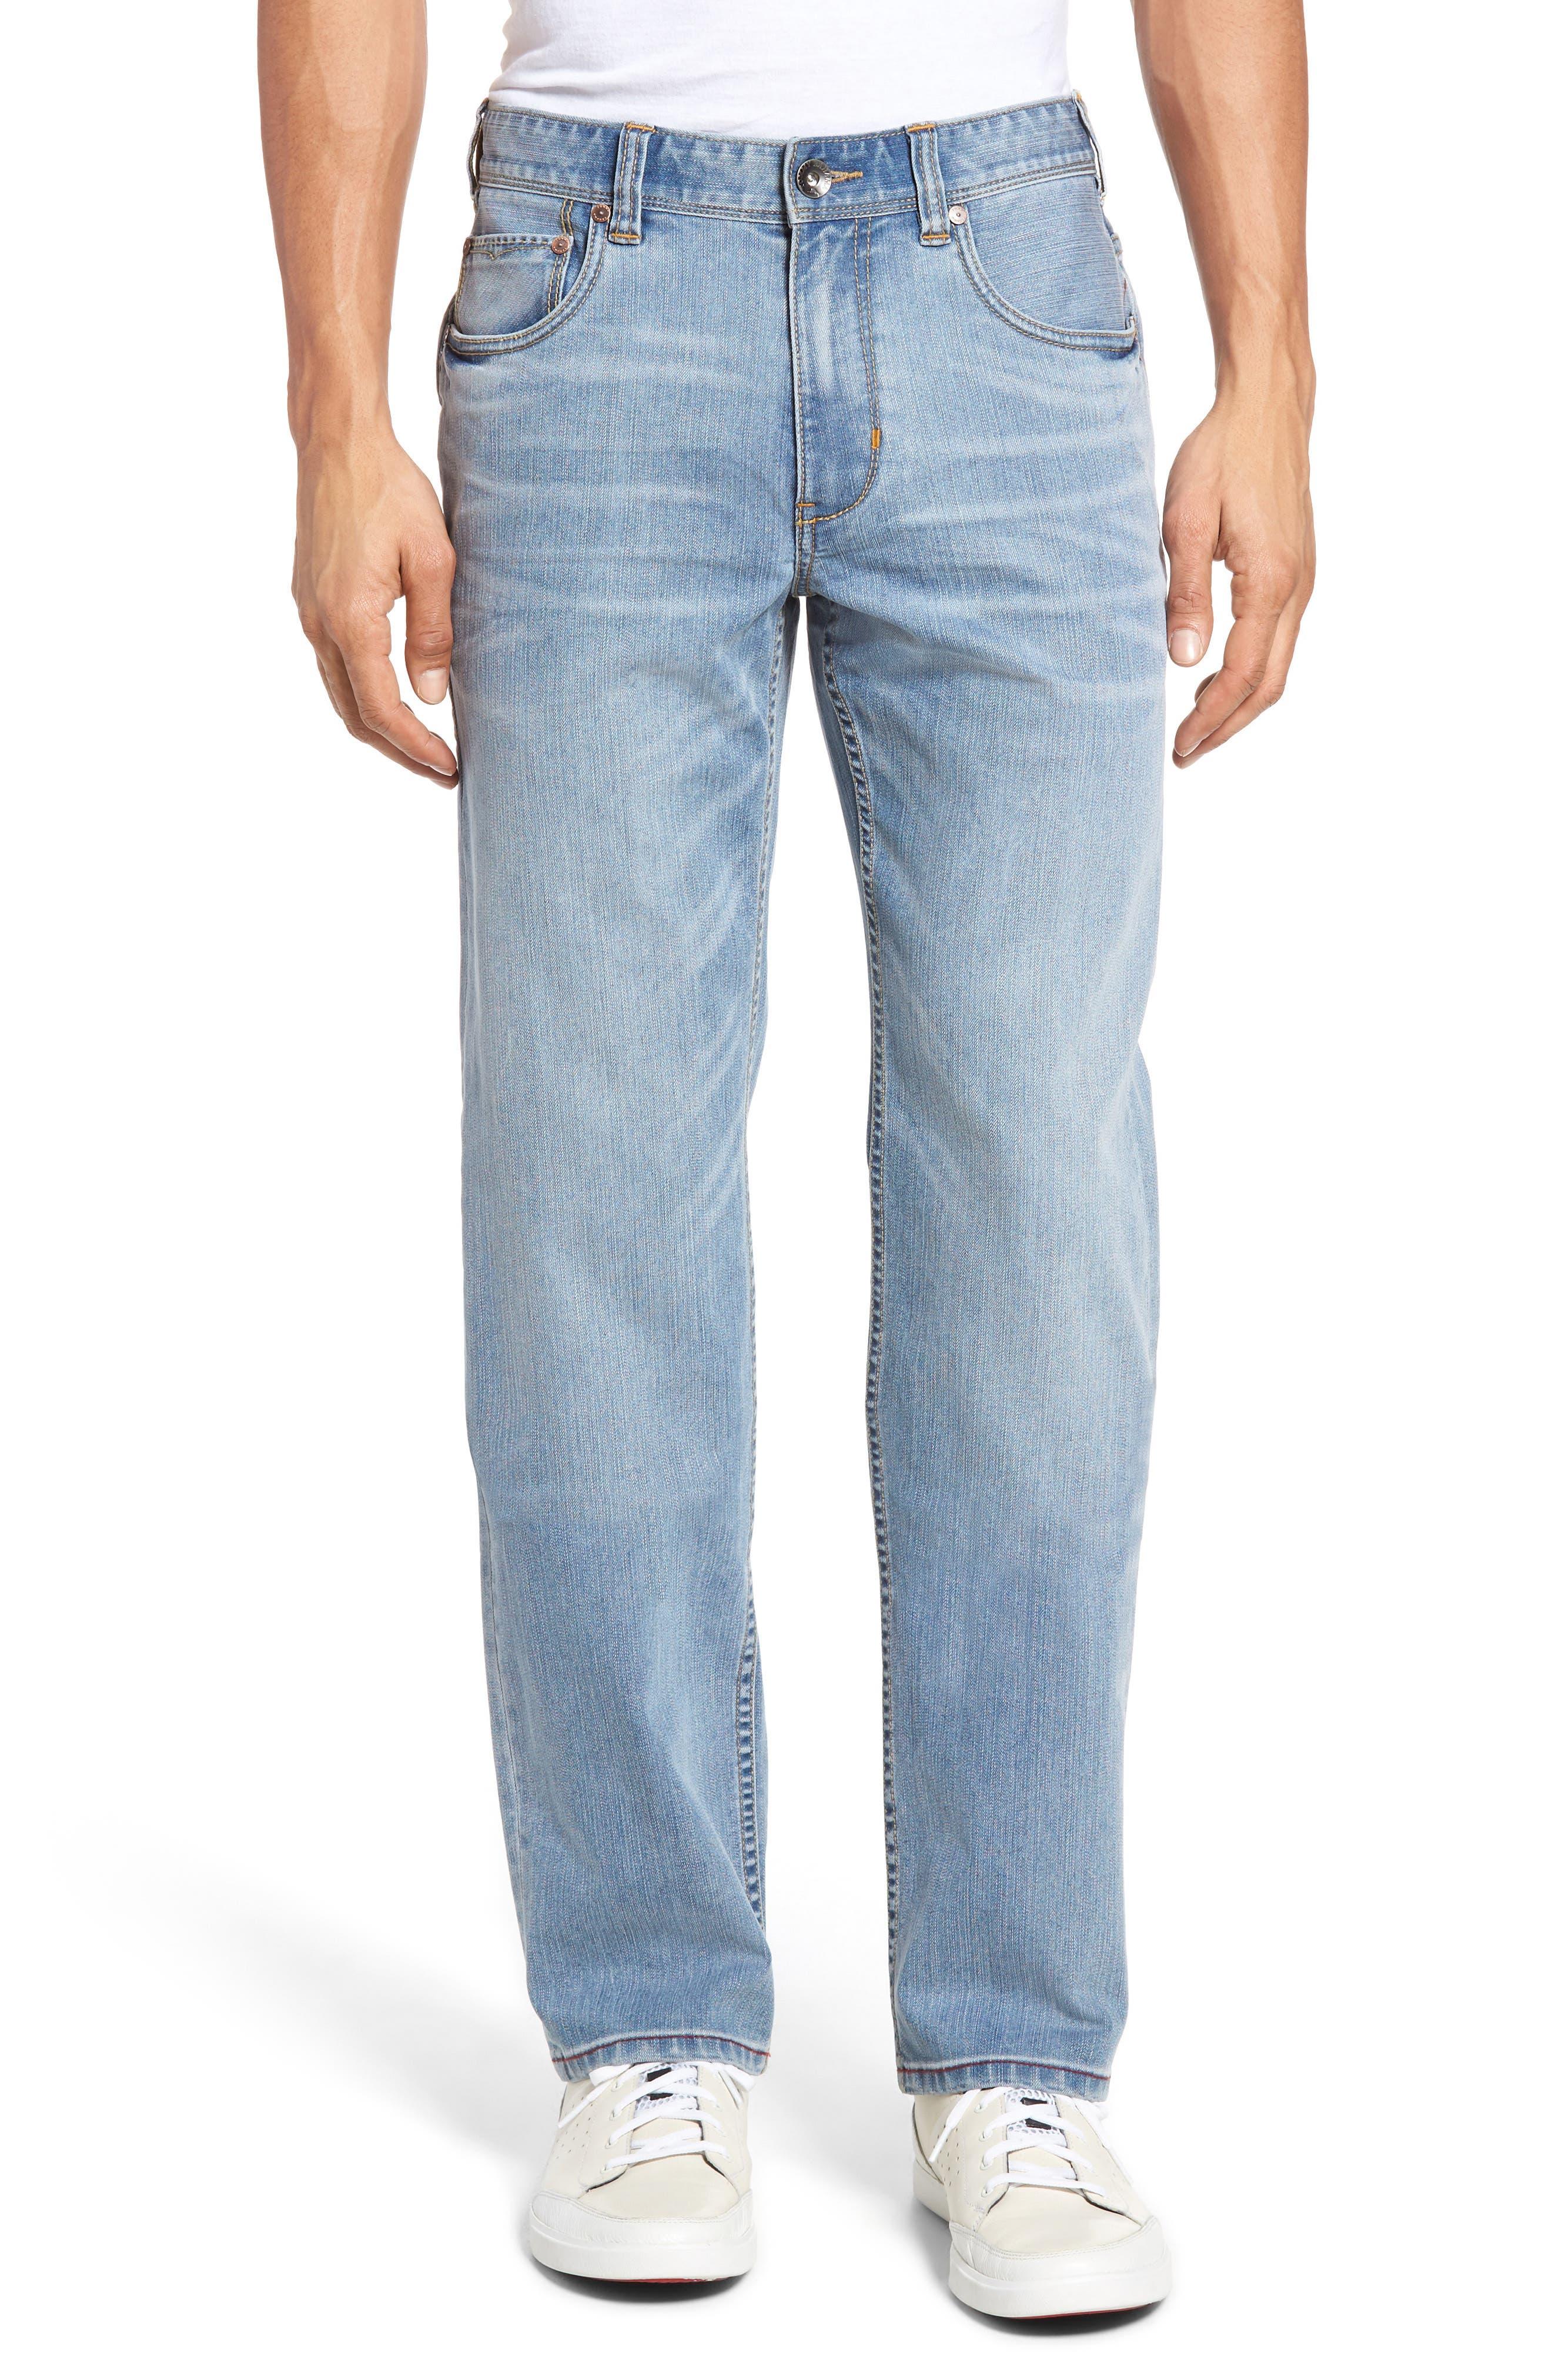 Sorrento Straight Leg Jeans,                             Main thumbnail 1, color,                             Light Wash